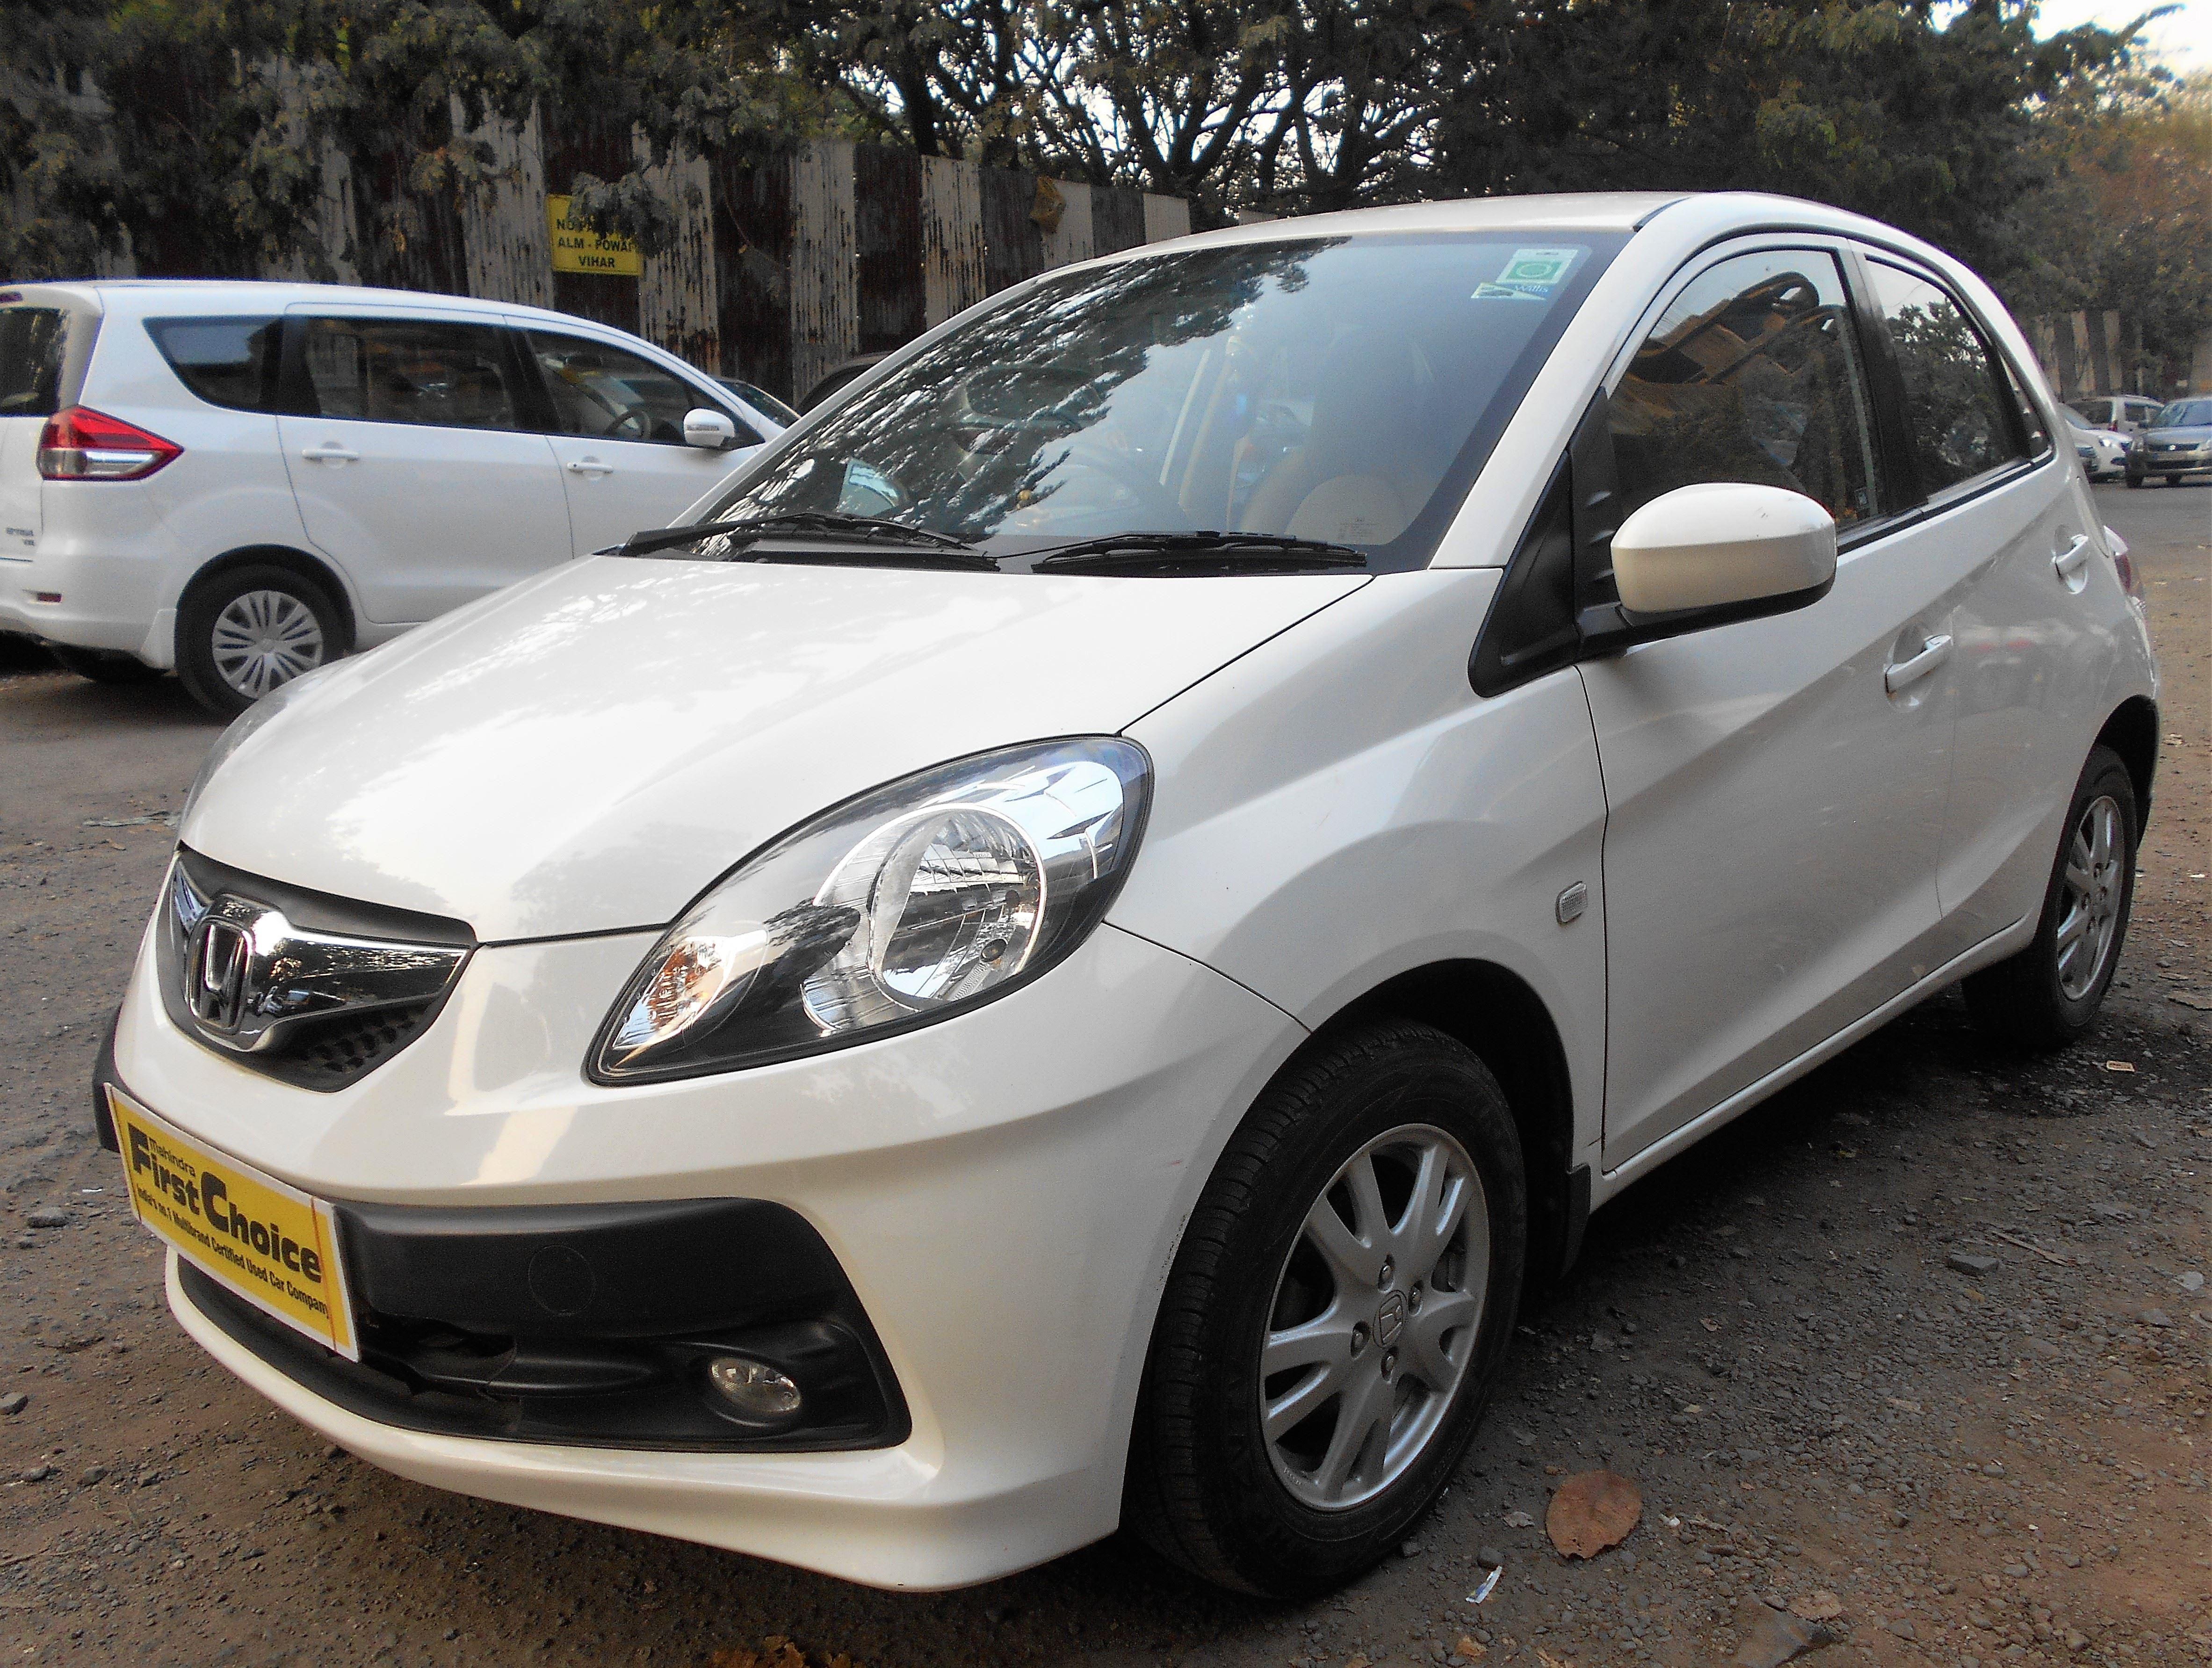 Used Cars Under 3 To 4 Lakh In Mumbai Mahindra First Choice Wheels